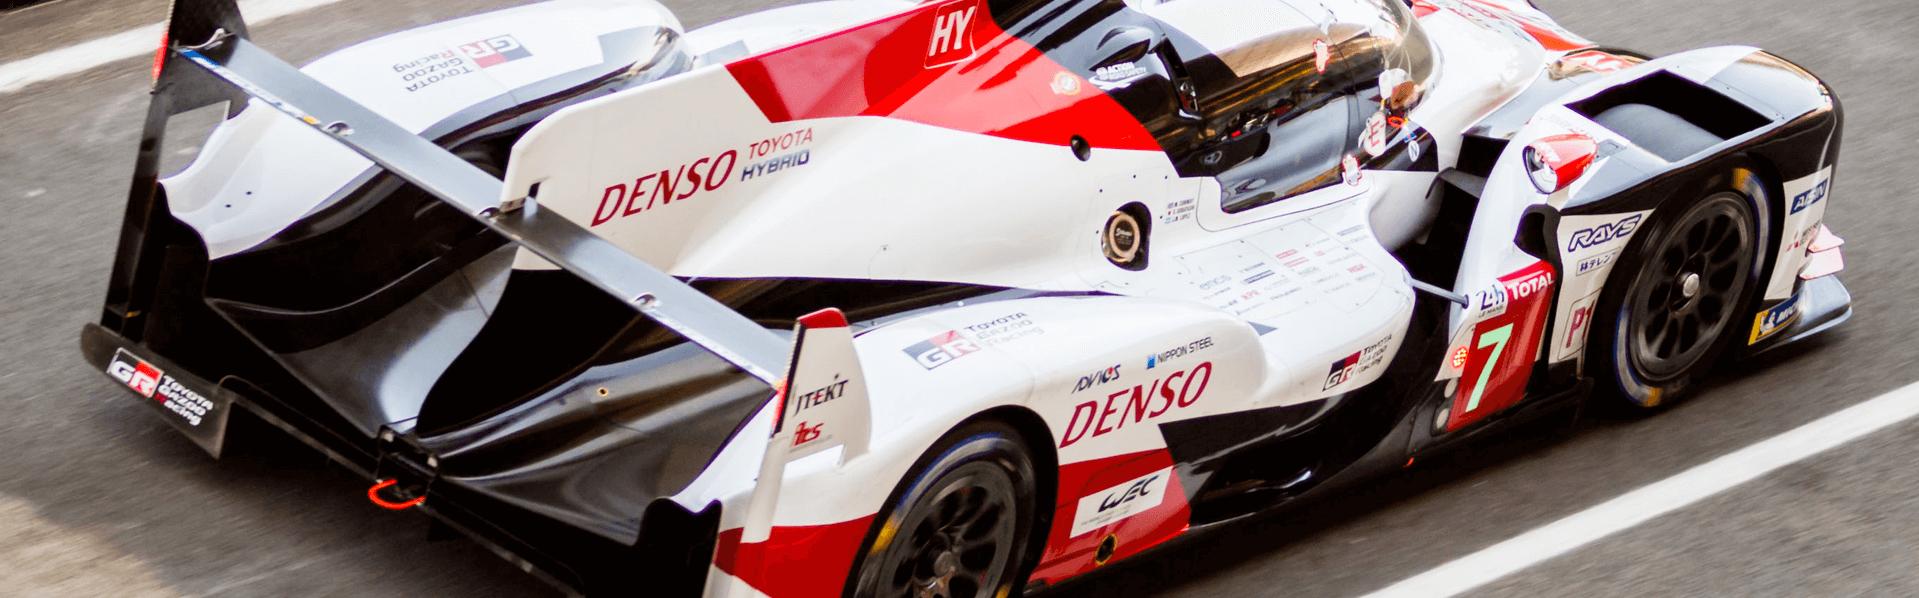 Lycian-Header-2020---Le-Mans-24hrs-sm